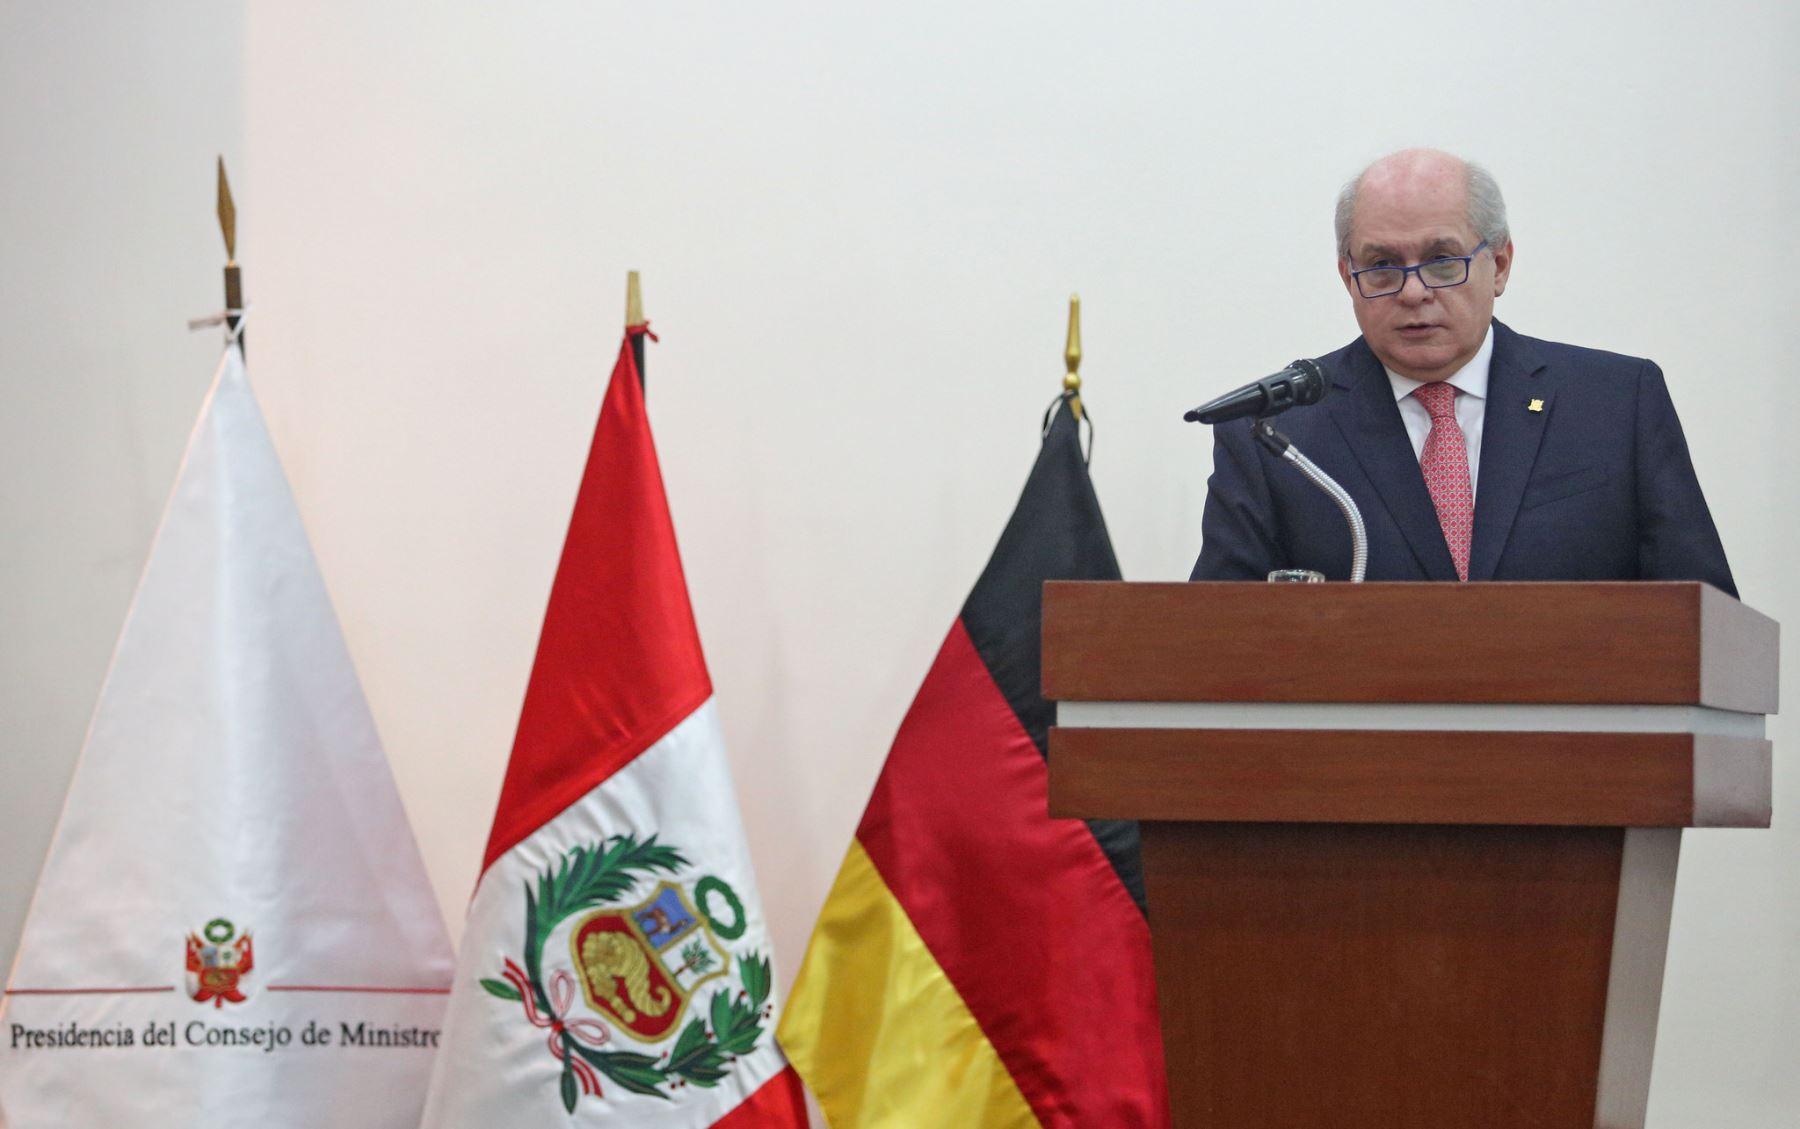 Congreso decidirá futuro de Kuczynski: En Perú